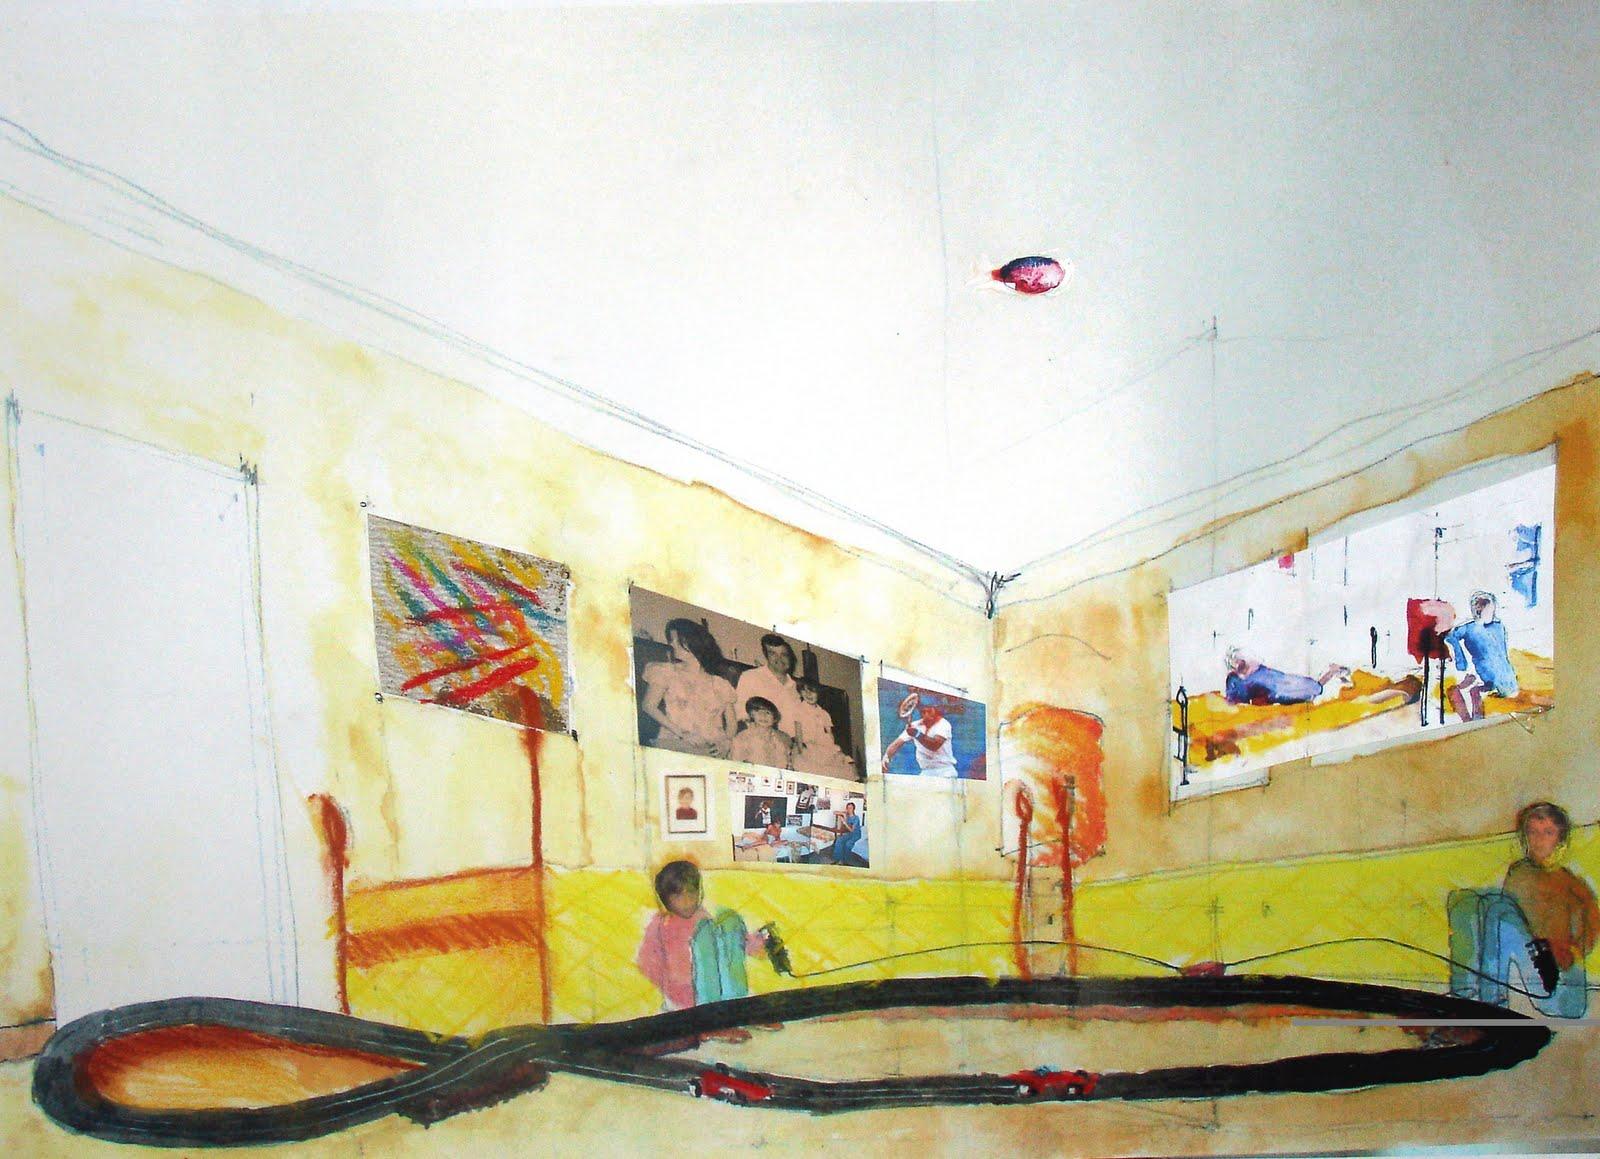 Gabriel gobelli pinturas habitacion infantil 35 x 50 - Pinturas habitacion infantil ...